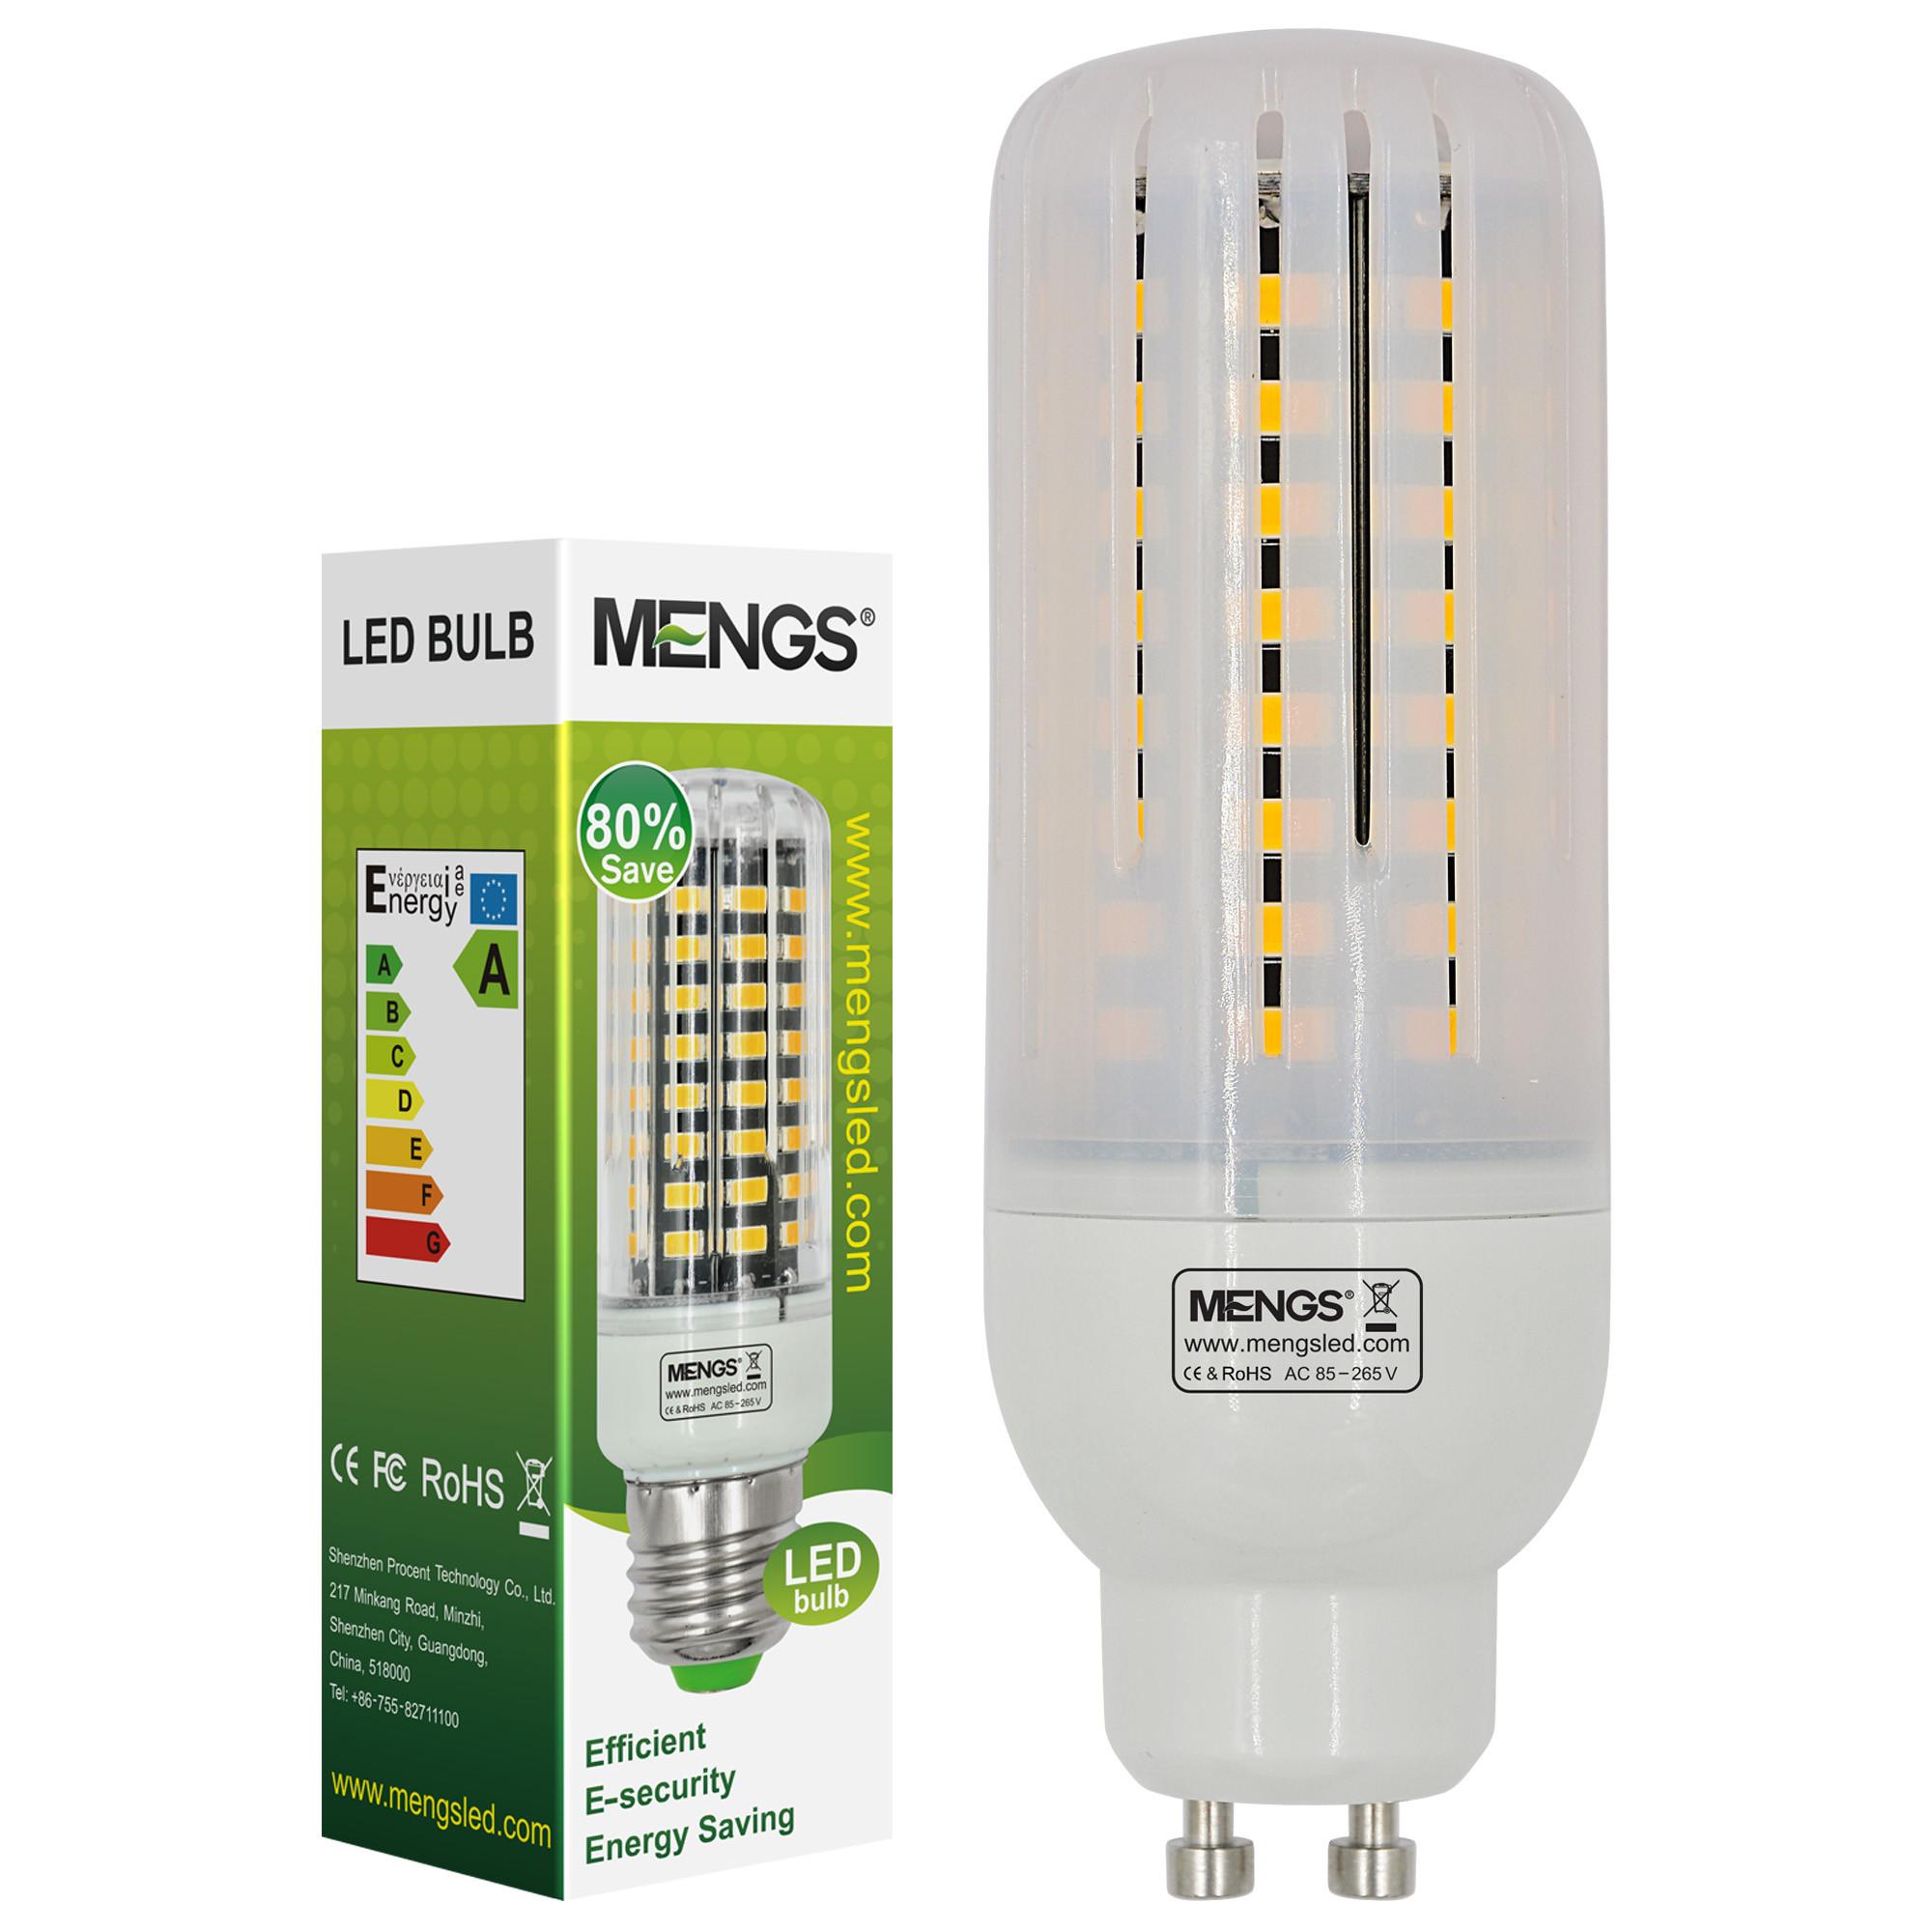 MENGS® Anti-Strobe GU10 9W LED Corn Light 72x 5736 SMD LB LED Bulb Lamp In Warm White Energy-Saving Lamp